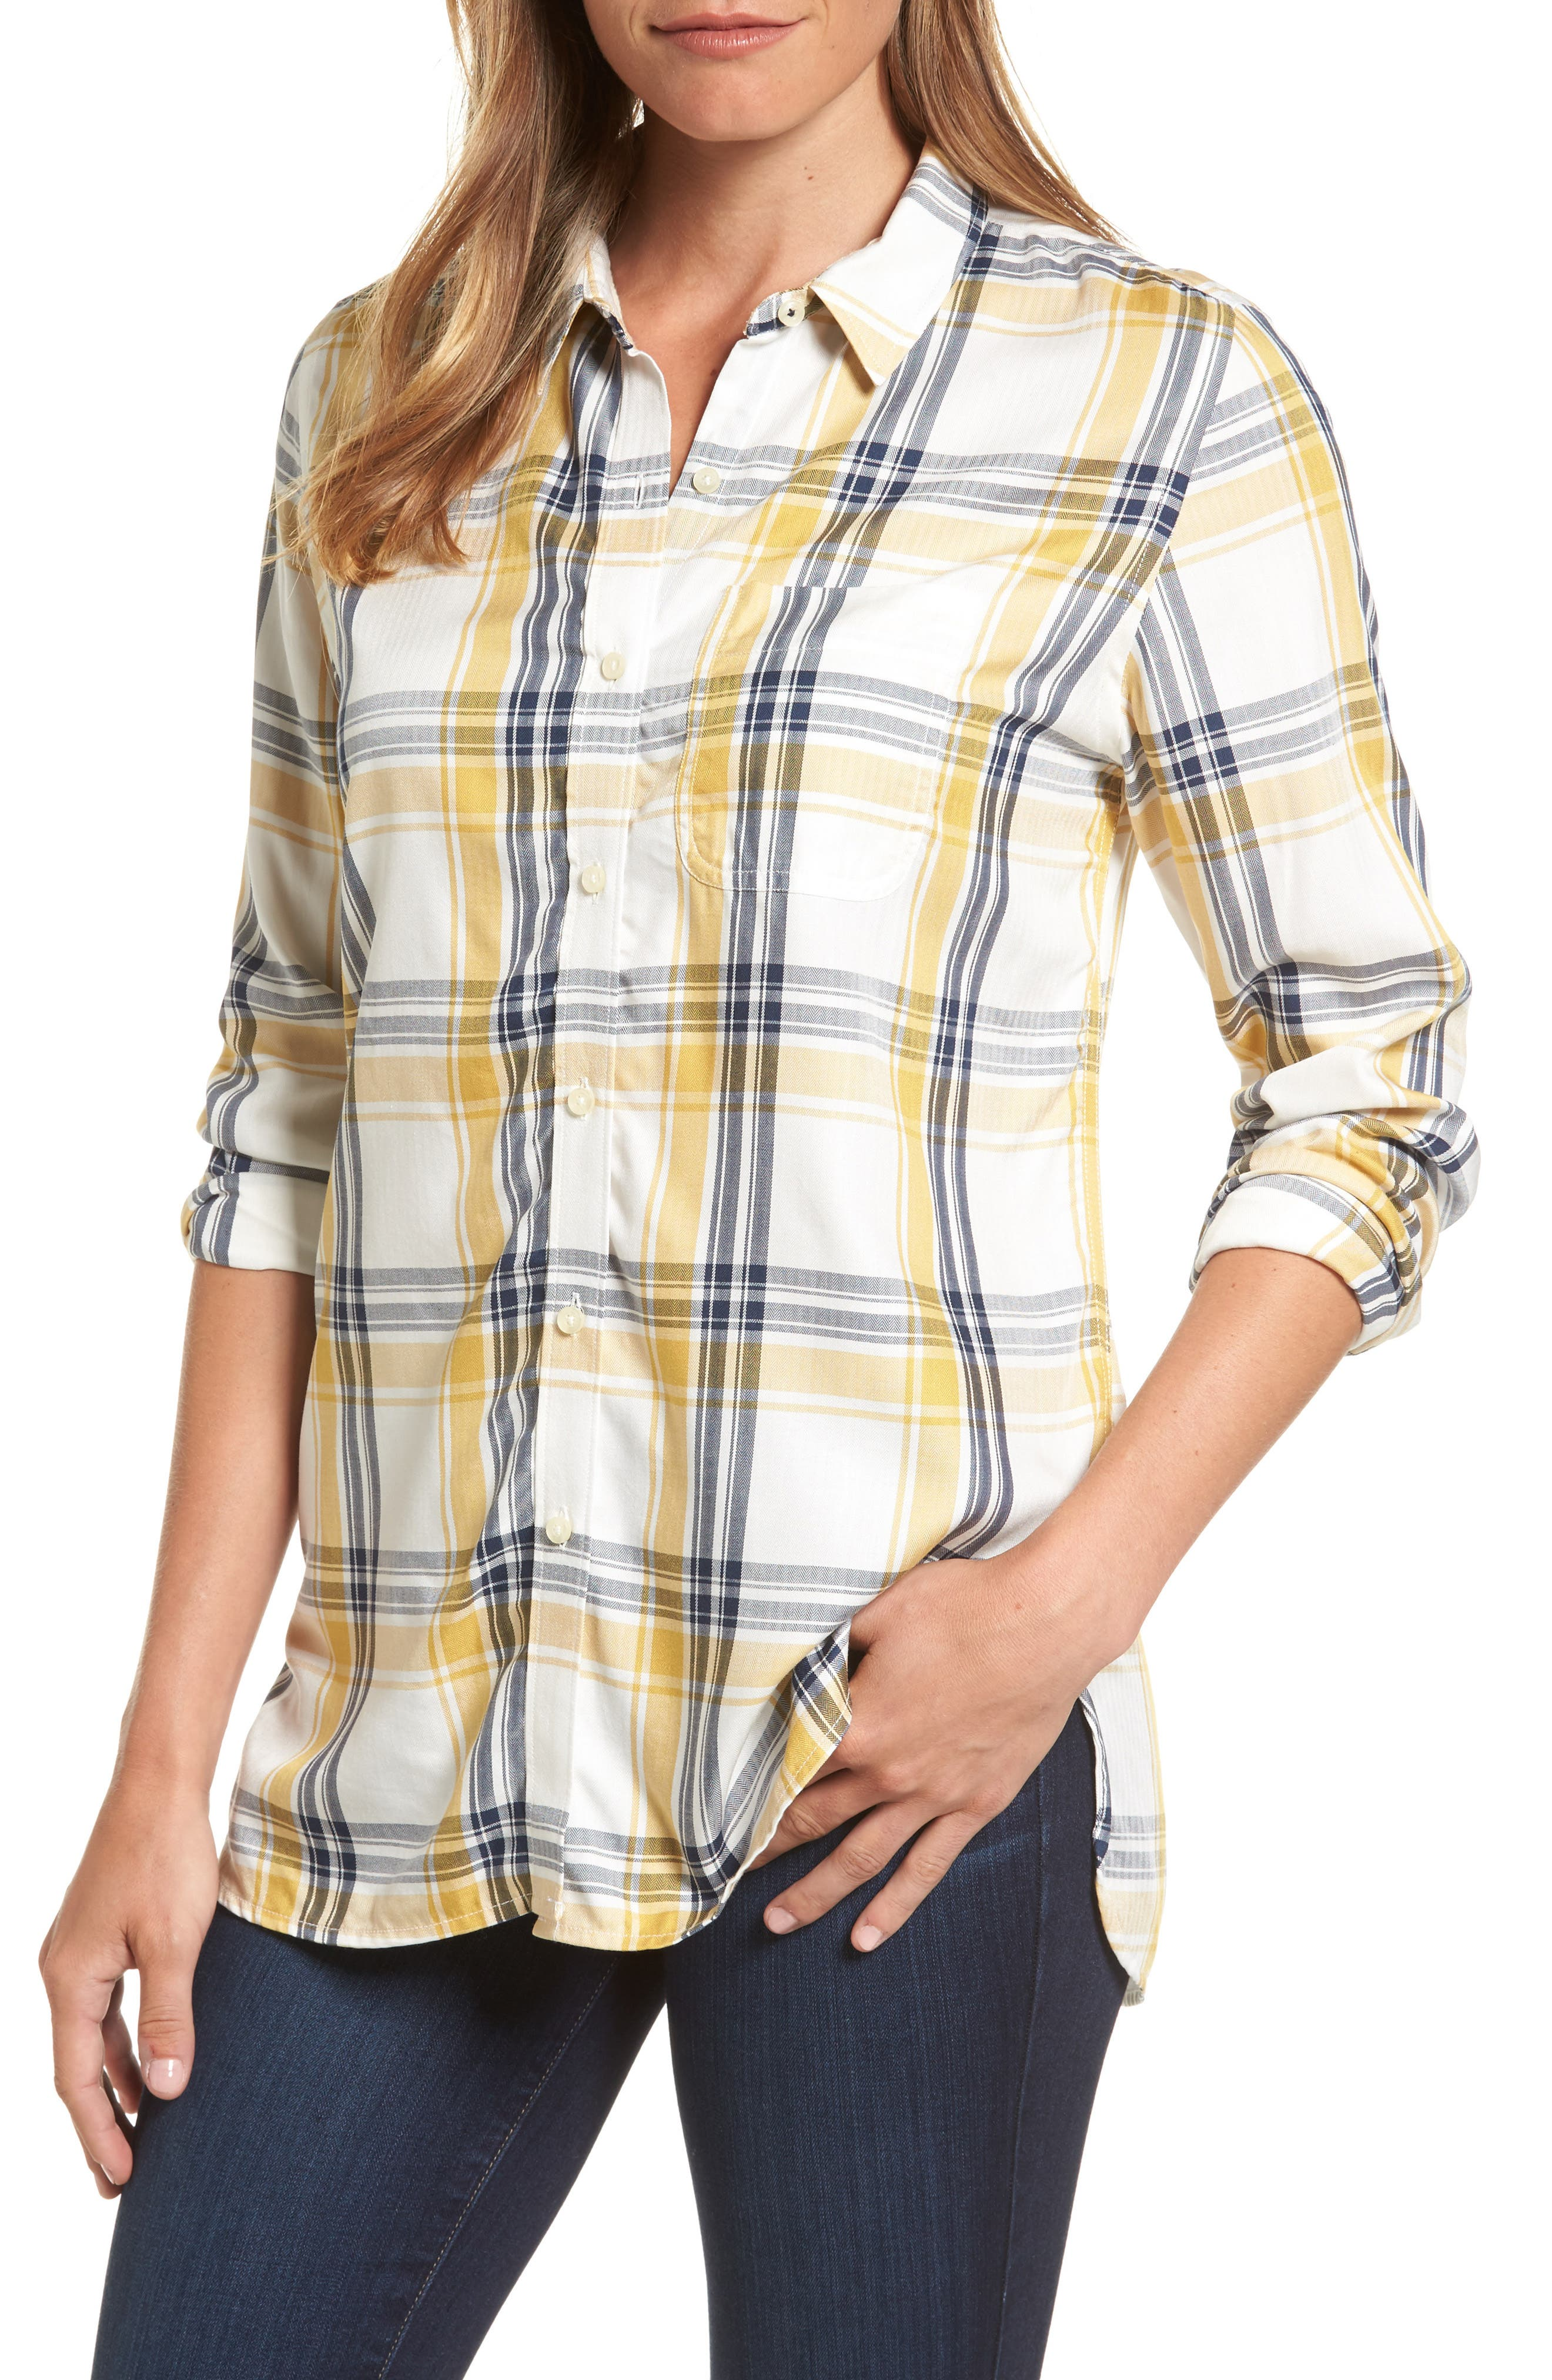 Newton Plaid Shirt,                             Main thumbnail 1, color,                             Sun Gold